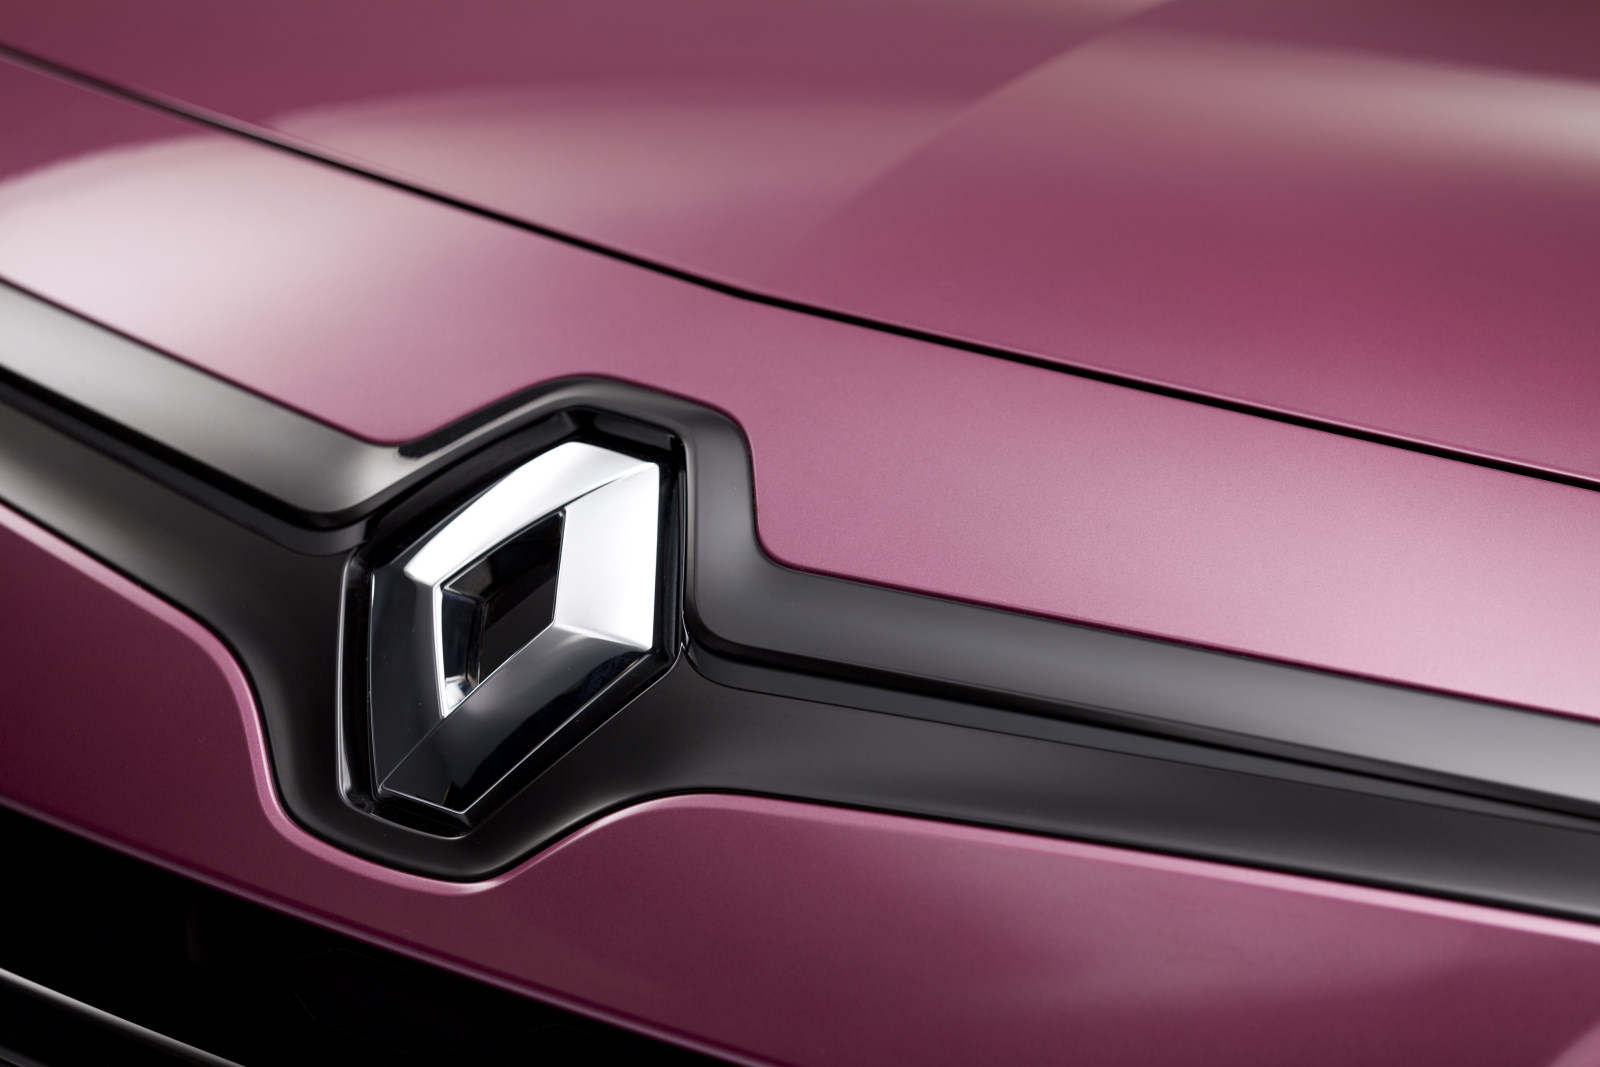 Renault Twingo 2012 logo, parrilla